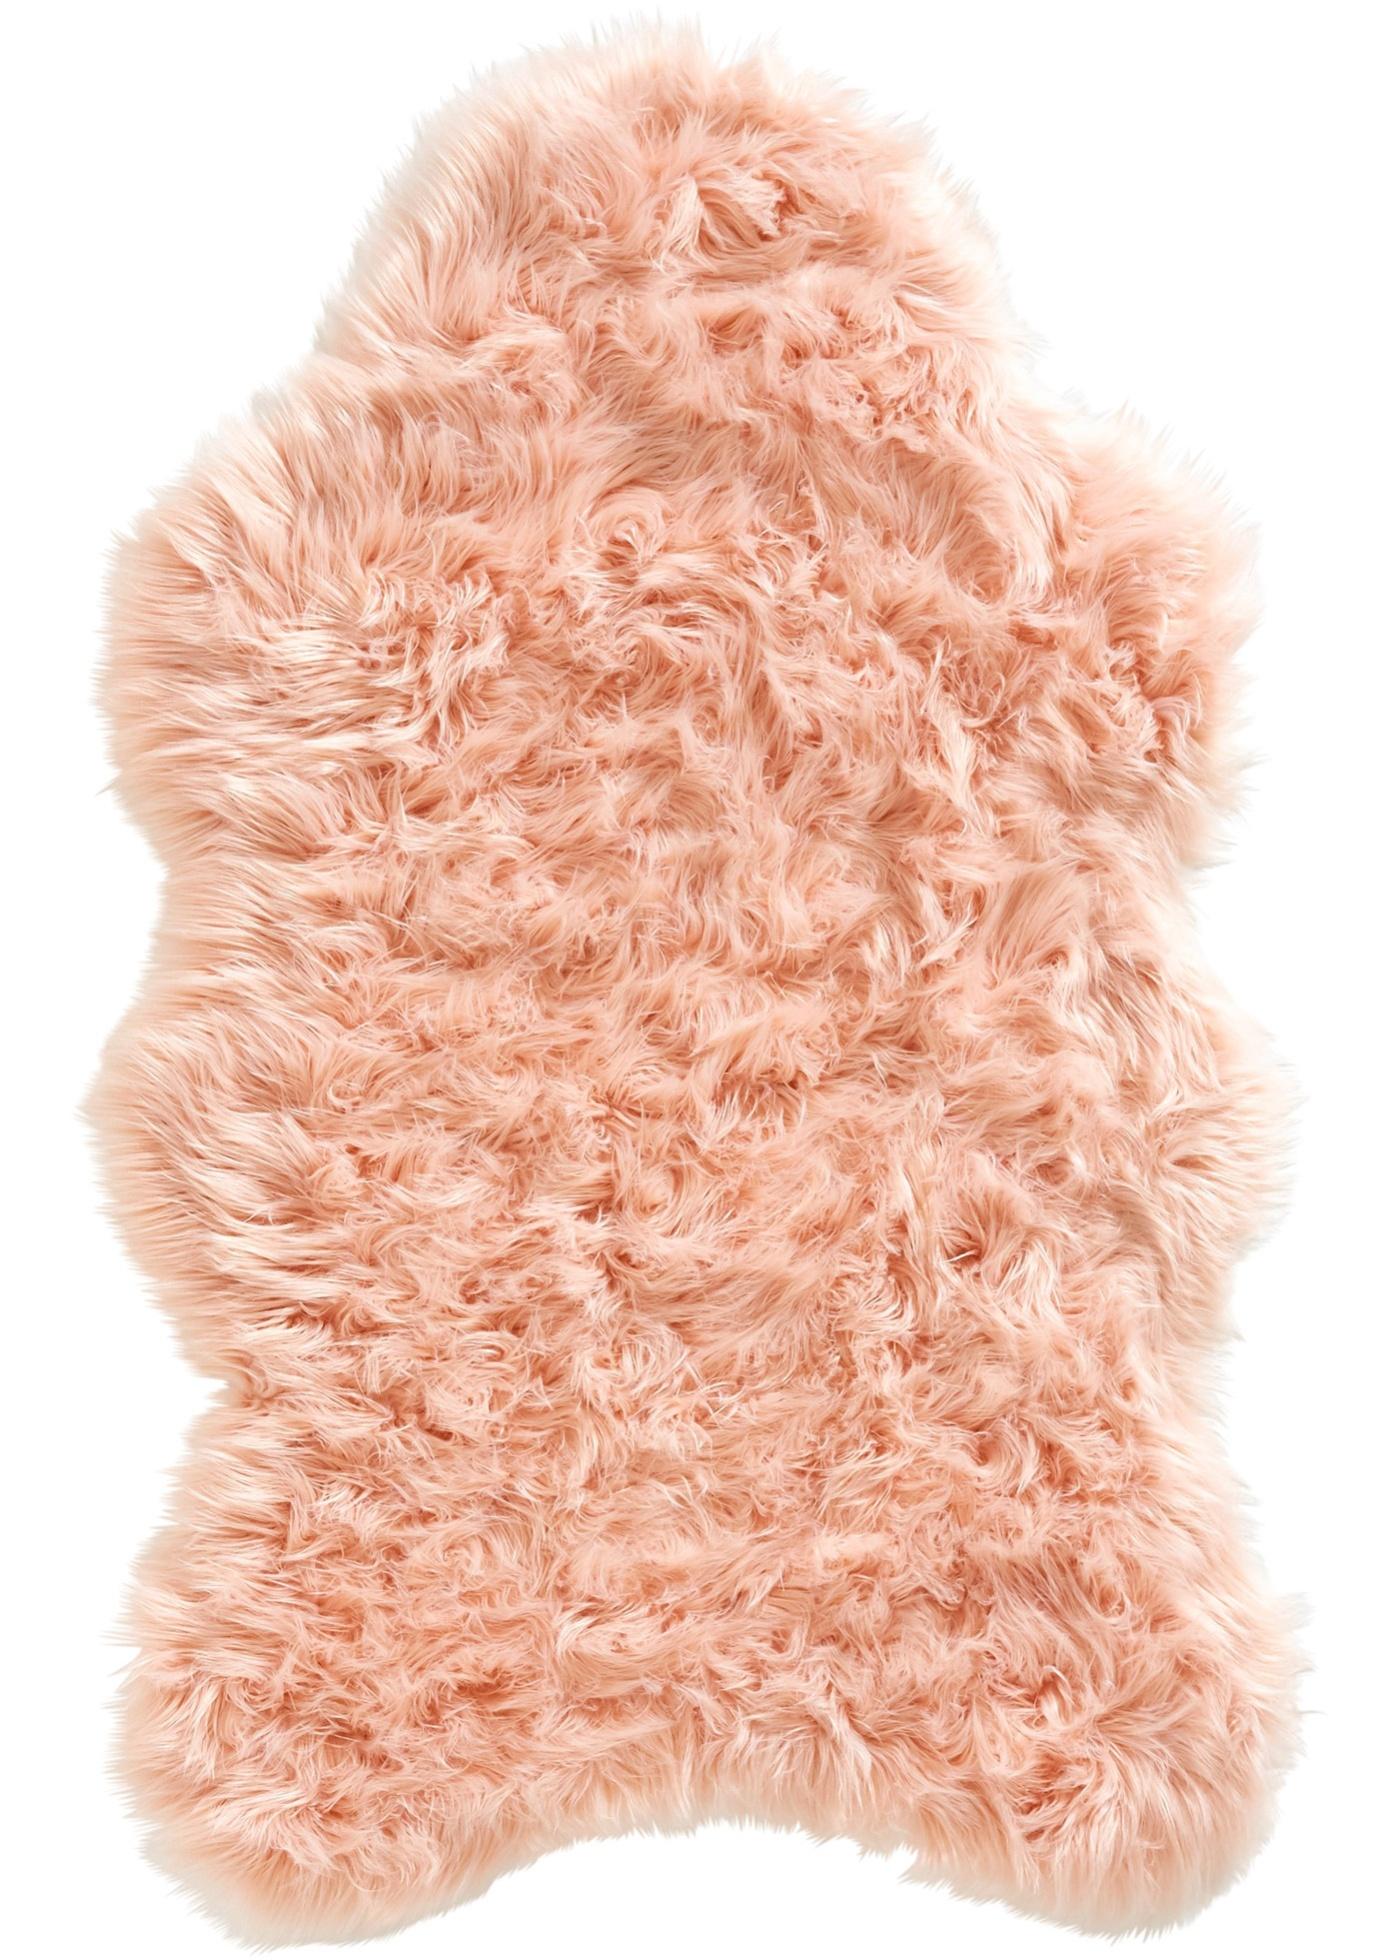 Synthetik Lammfell mit besonders dichtem Flor in rosa von bonprix